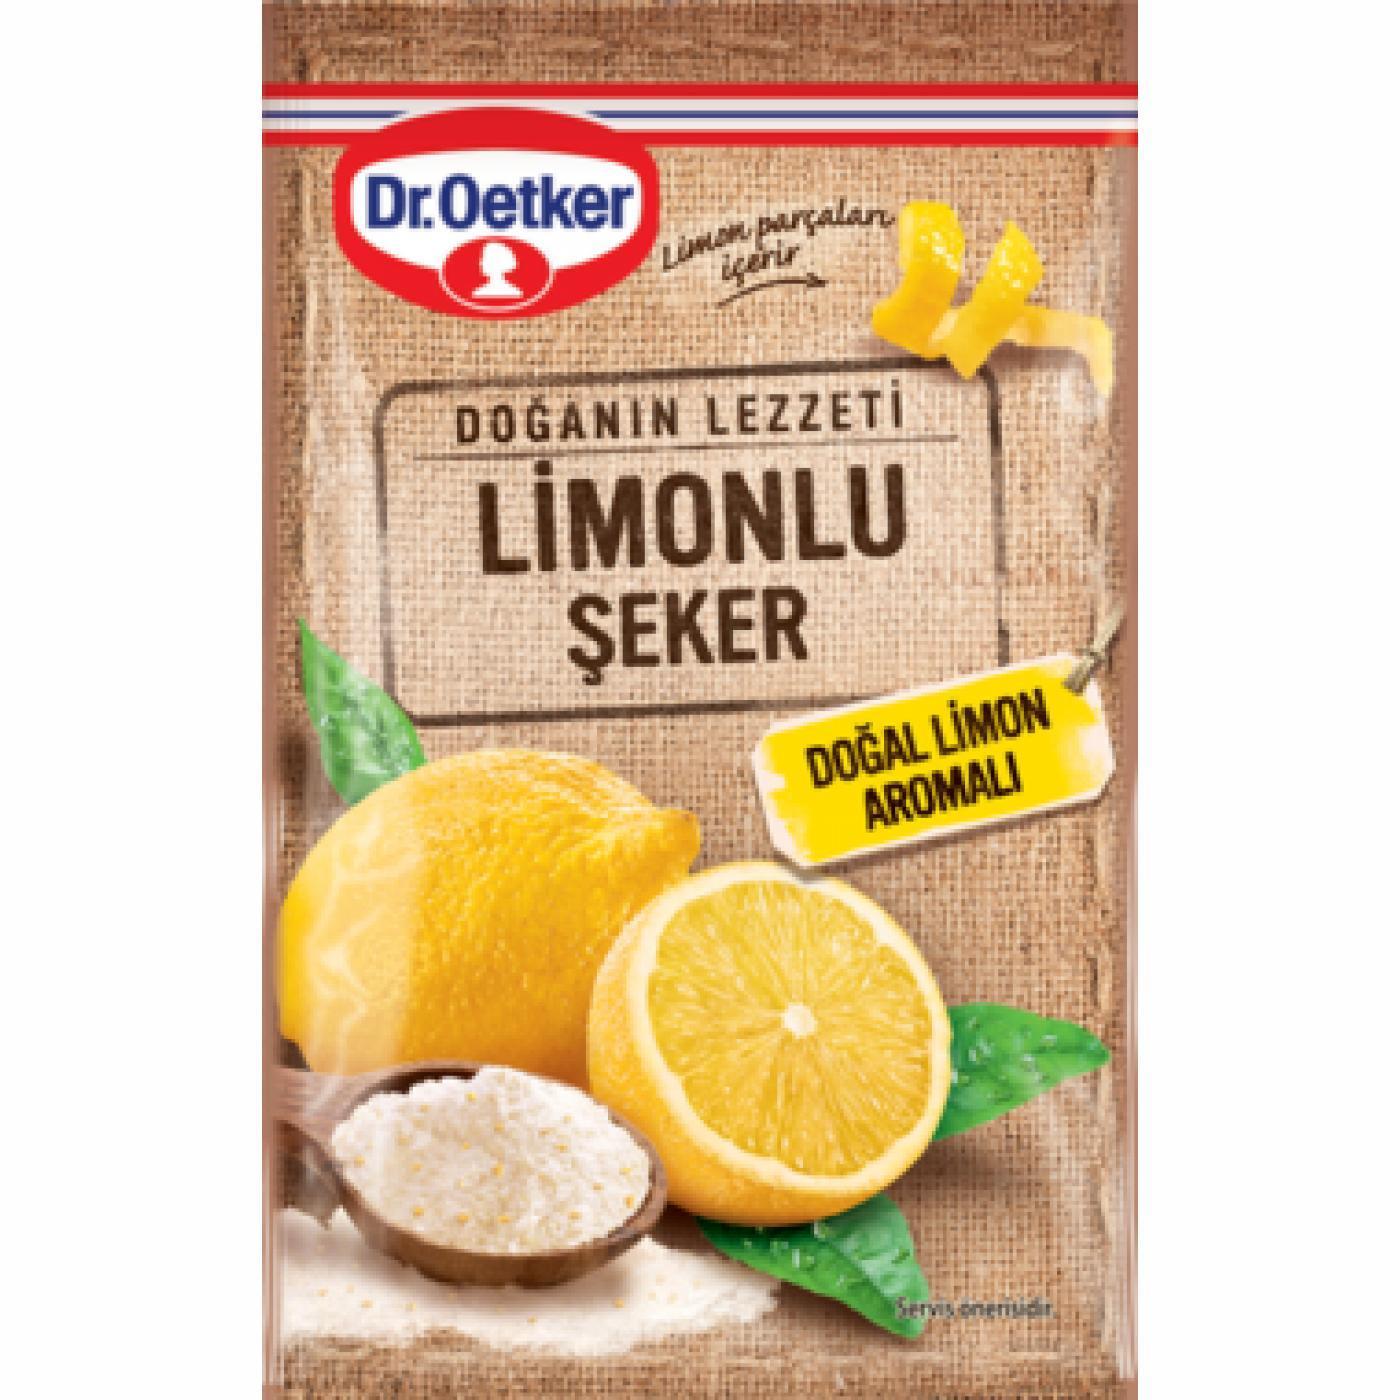 DR.OETKER LİMONLU ŞEKER 14GR